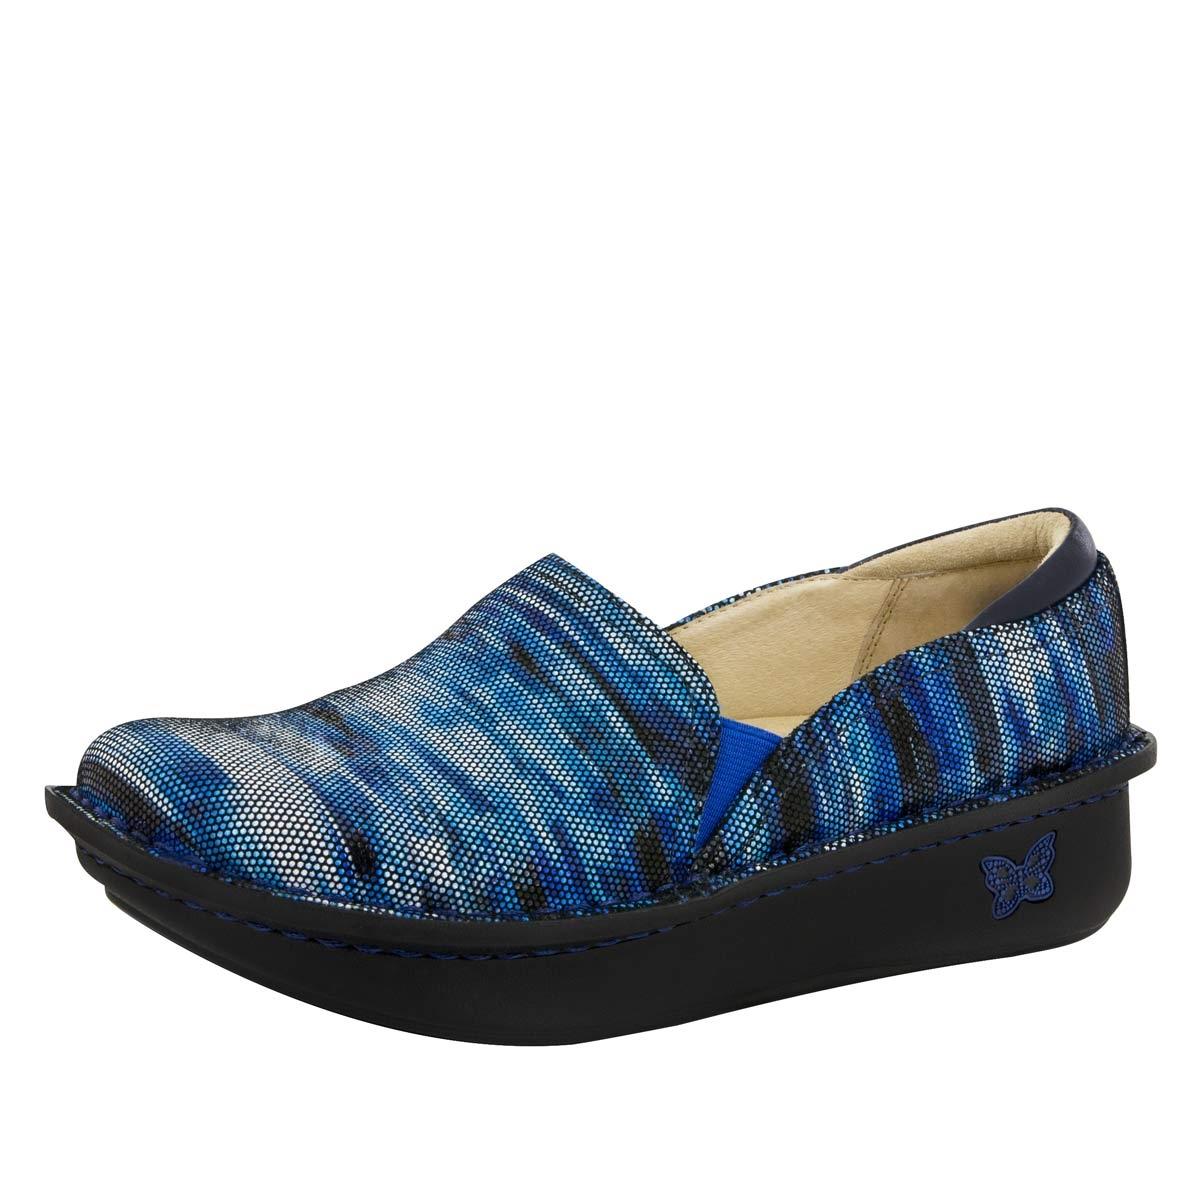 Navy Blue Nursing Shoes